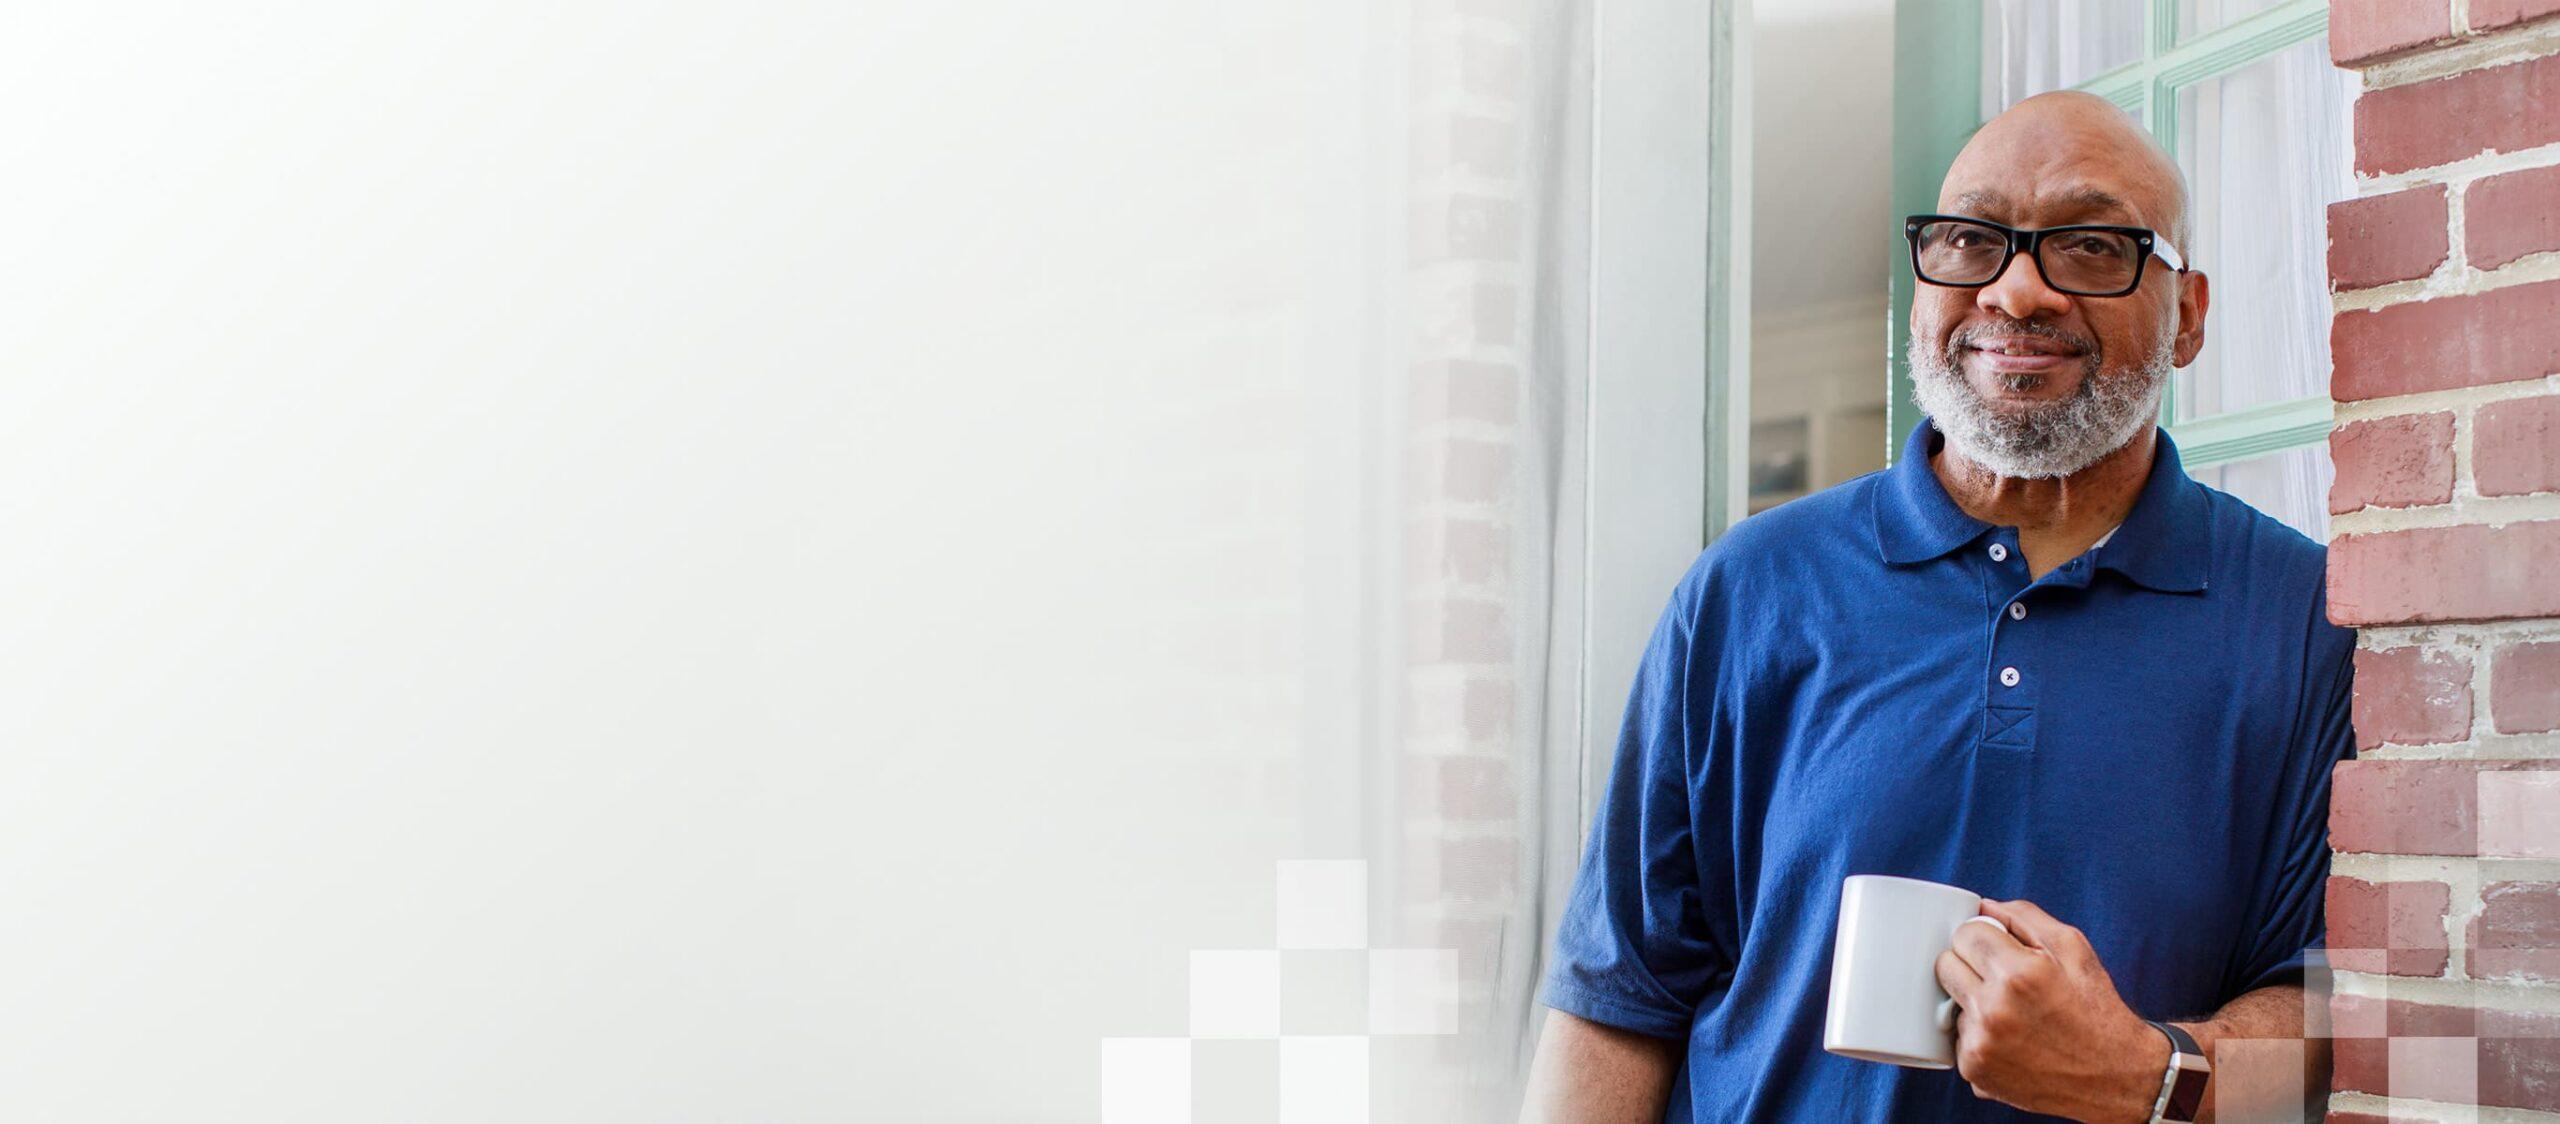 Patrick G, Kidney transplant recipient